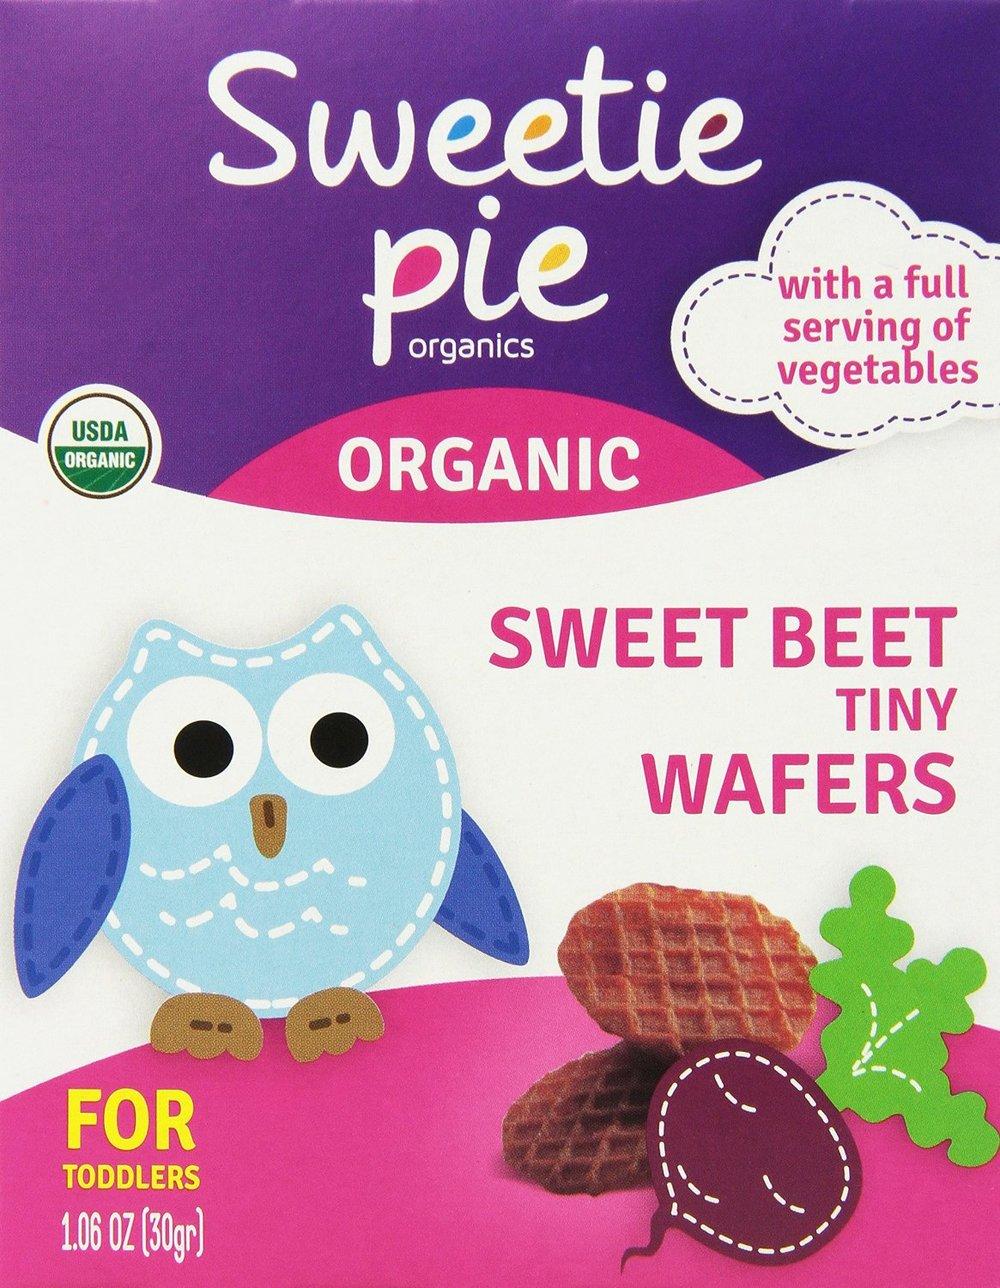 Sweet Beet